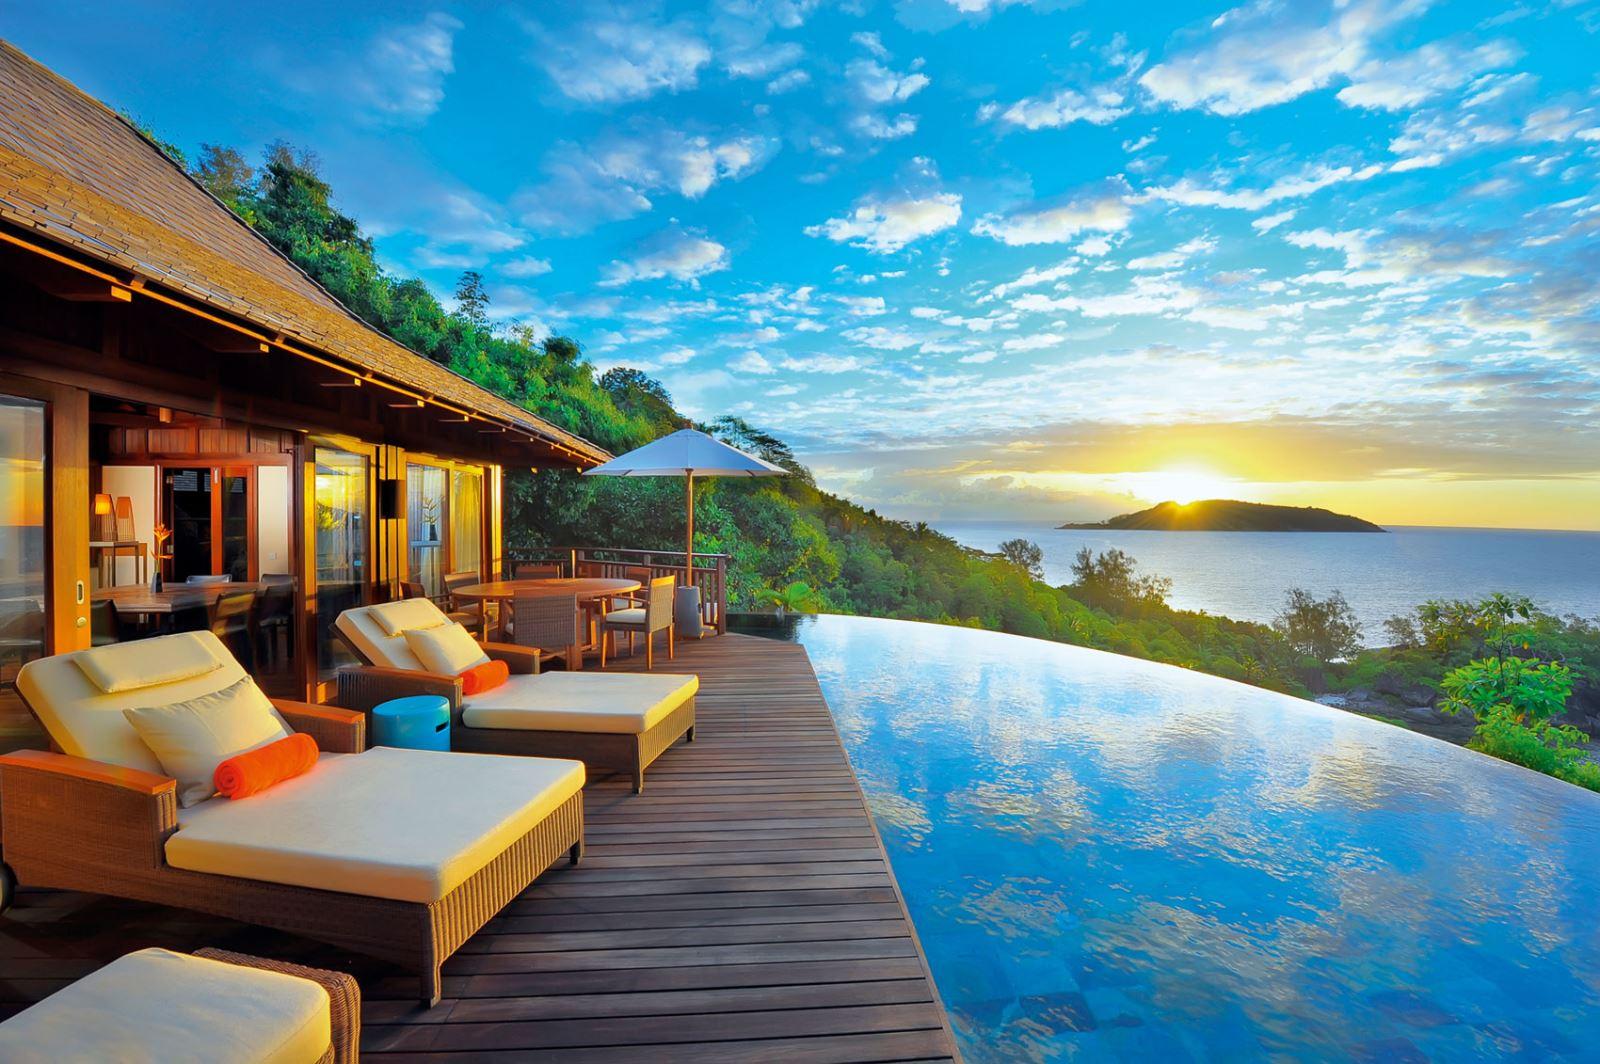 constance ephelia resort room suggestion banyan tree